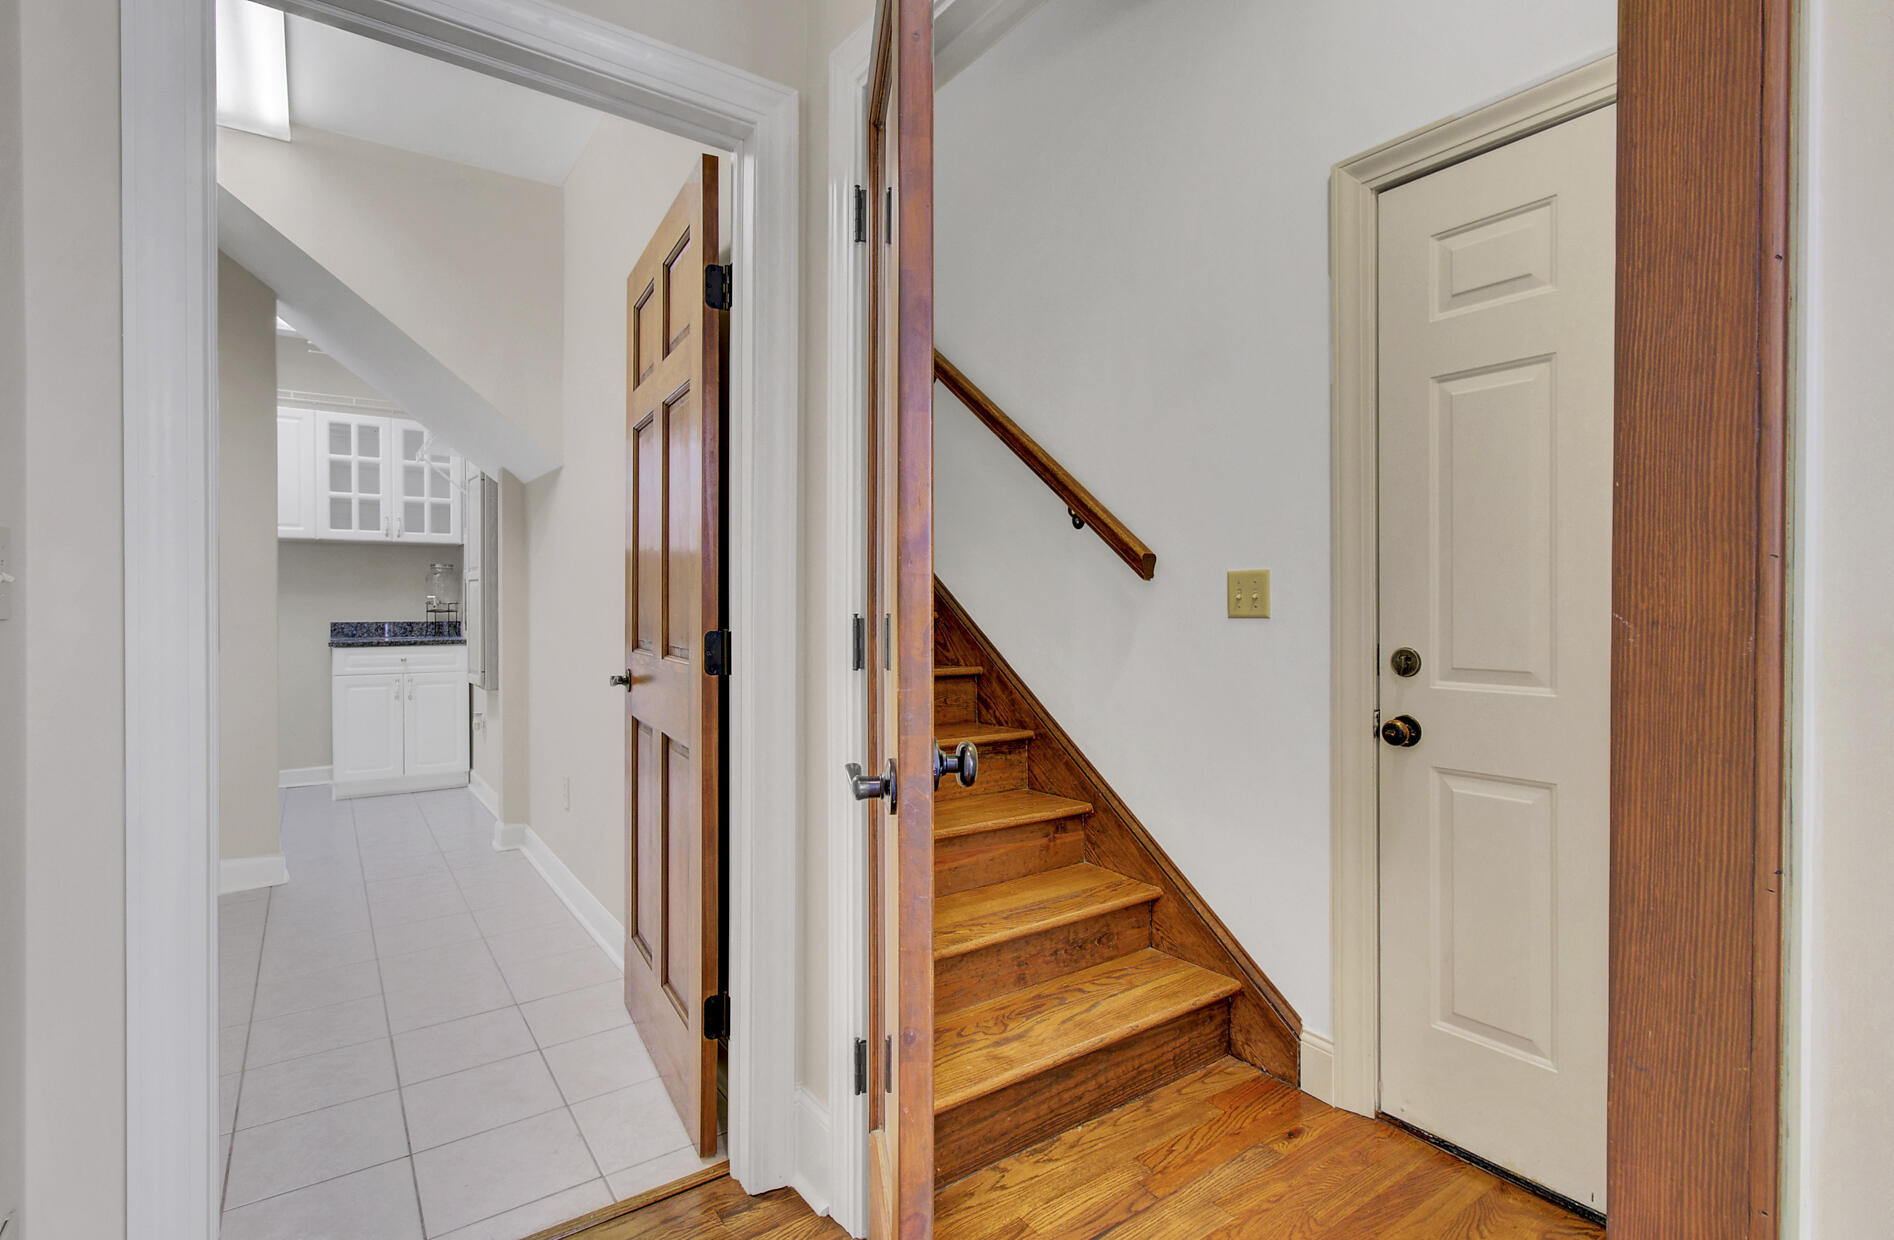 Dunes West Homes For Sale - 4123 Colonel Vanderhorst, Mount Pleasant, SC - 3